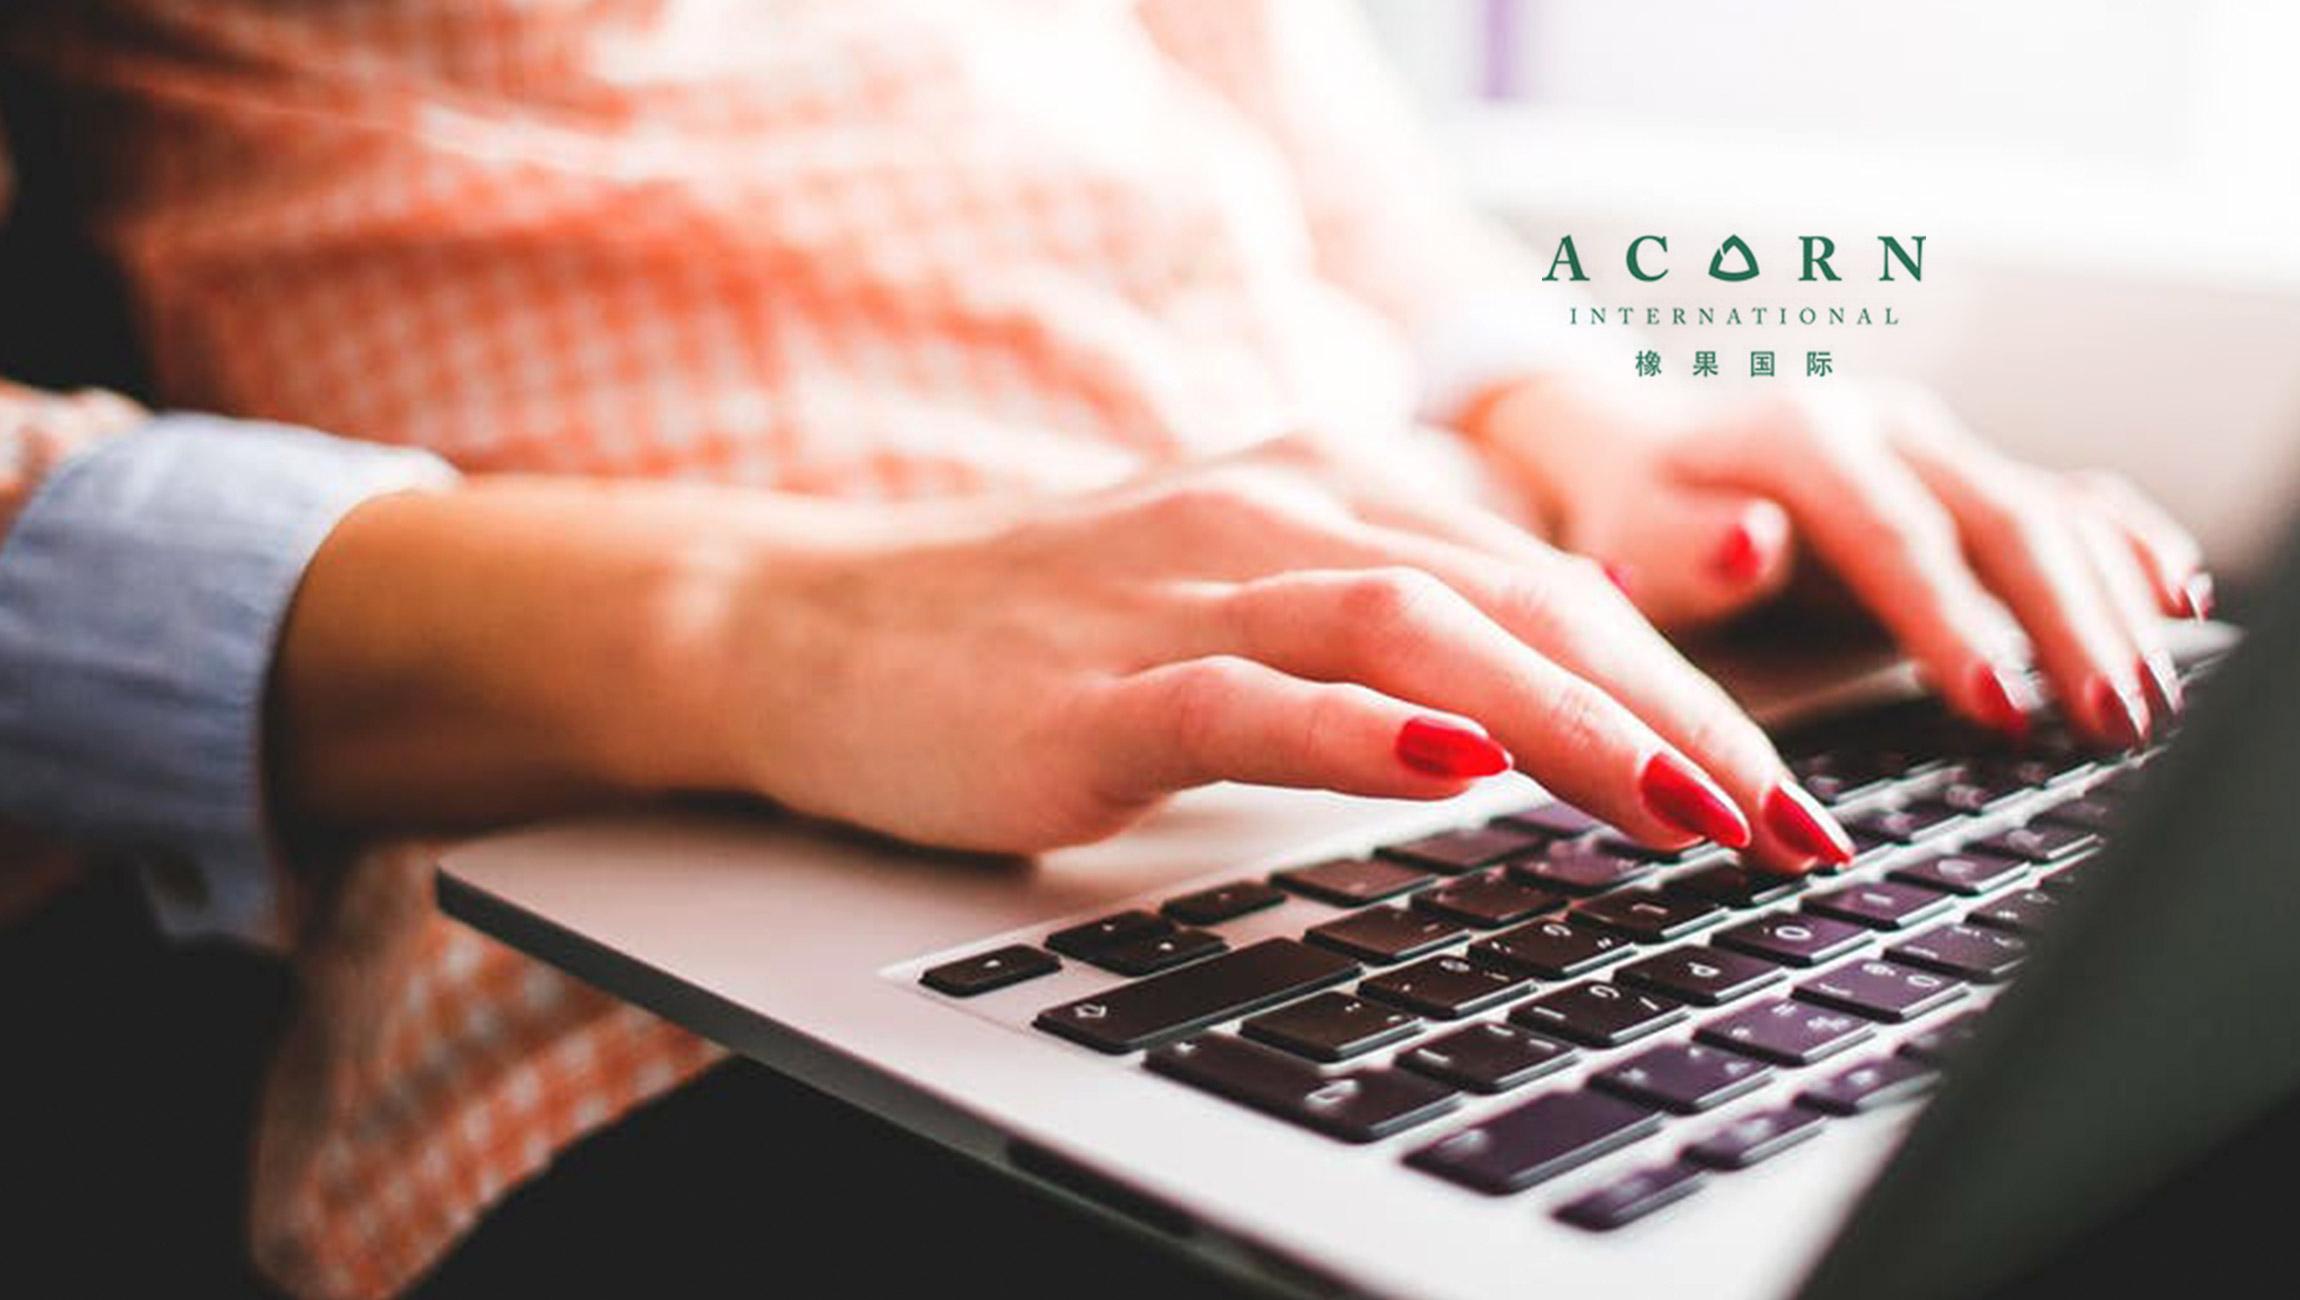 Acorn International Establishes Acorn Digital Services